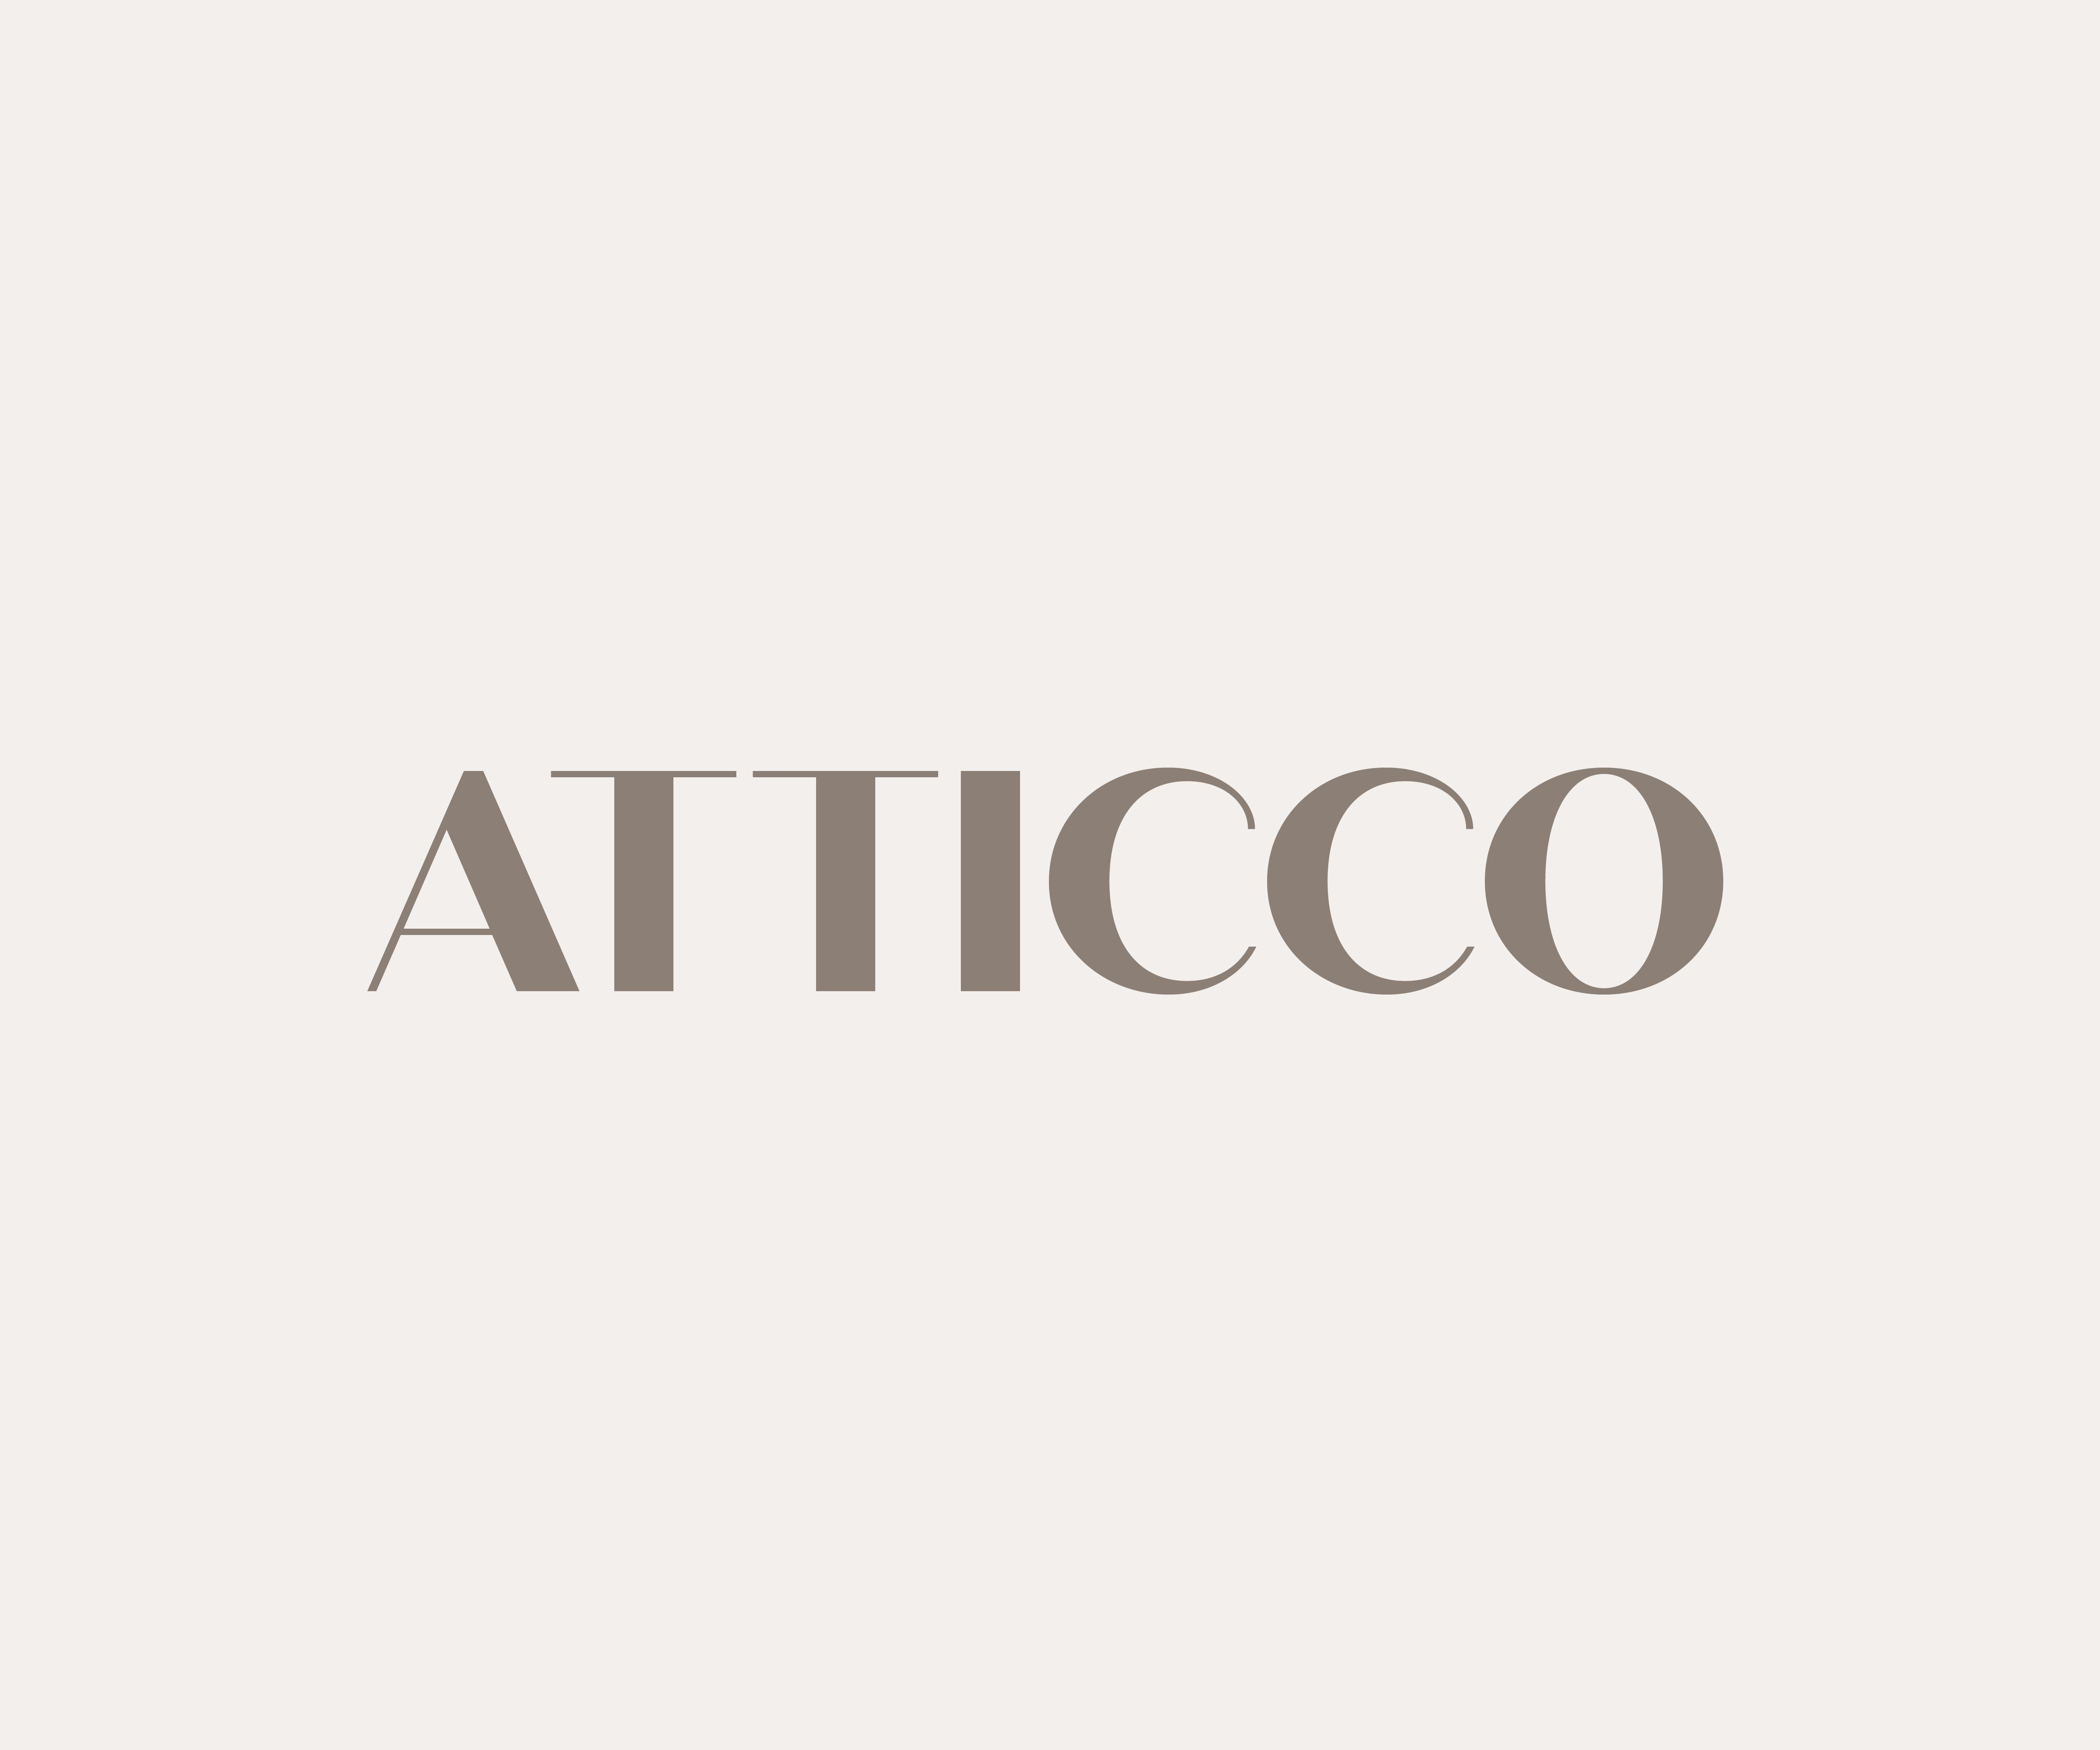 Atticco identitet